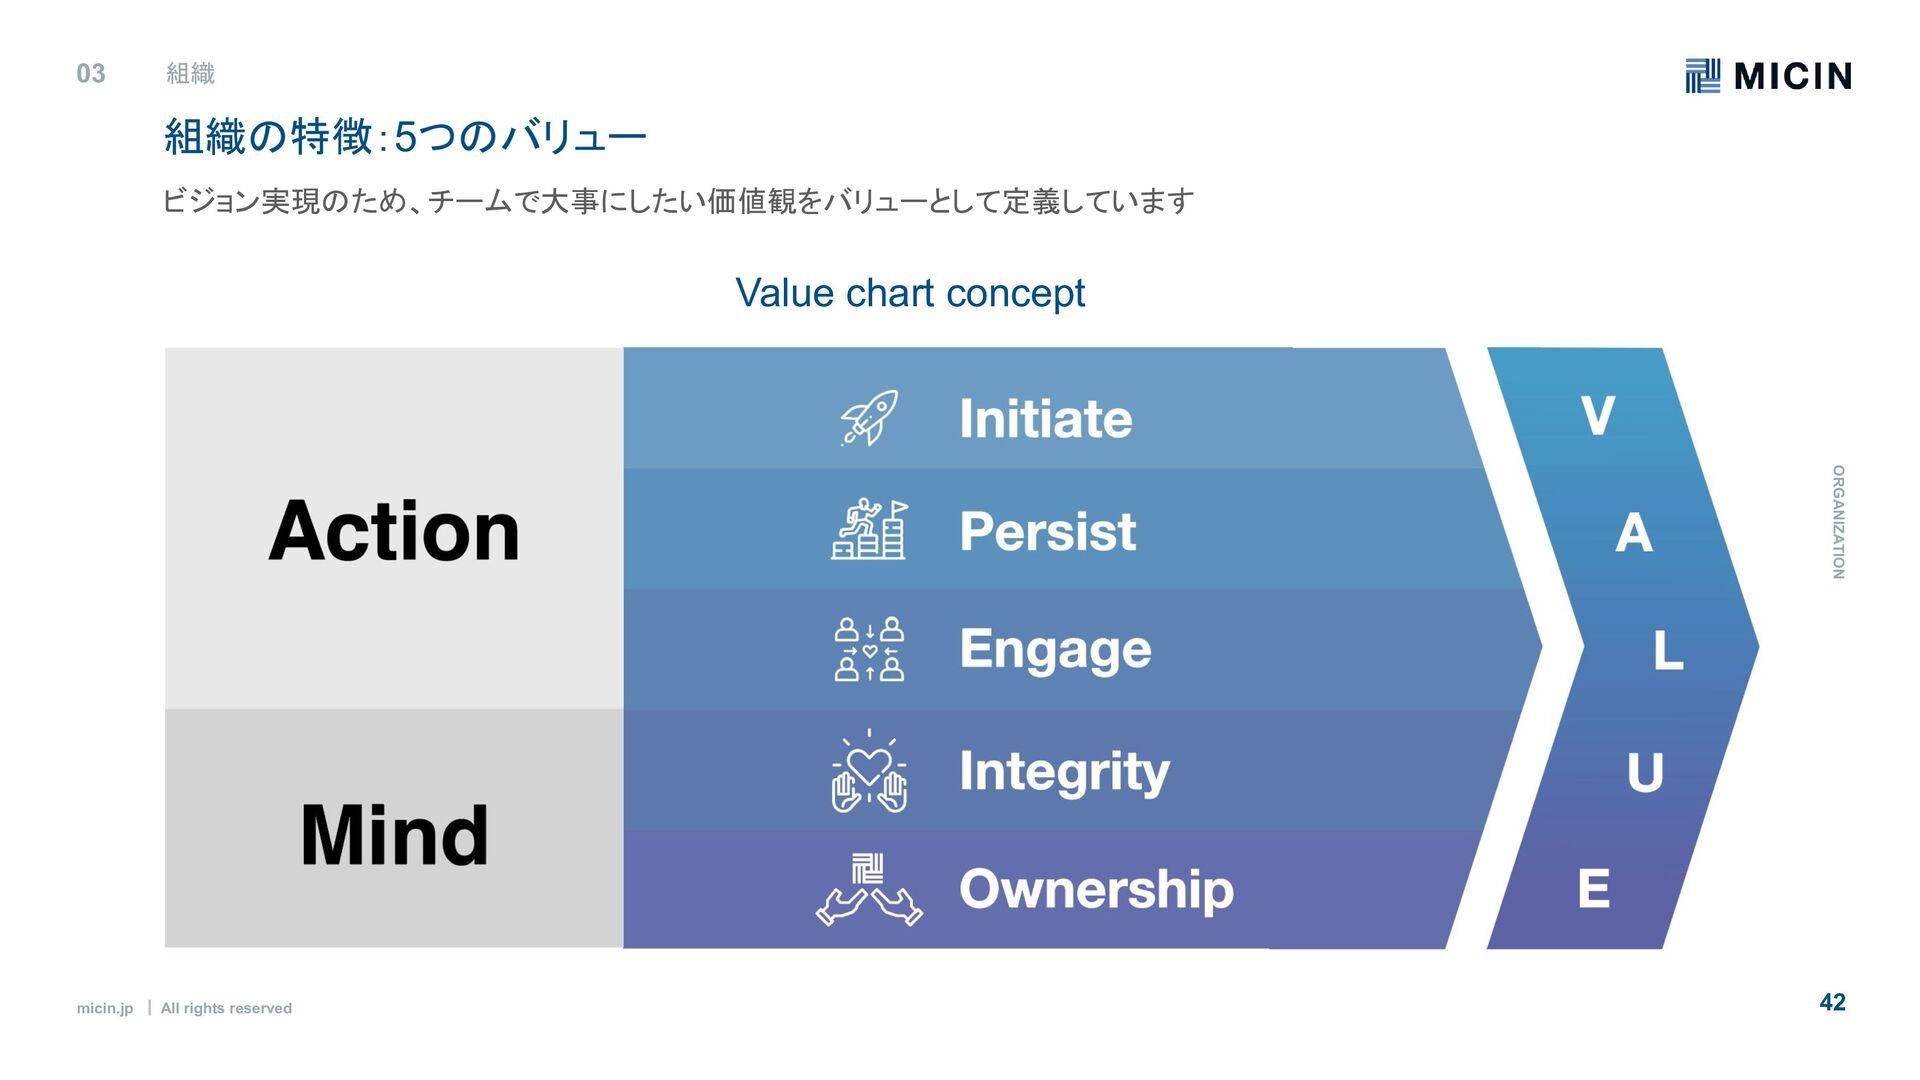 micin.jp   All rights reserved 4 2 micin.jp   A...